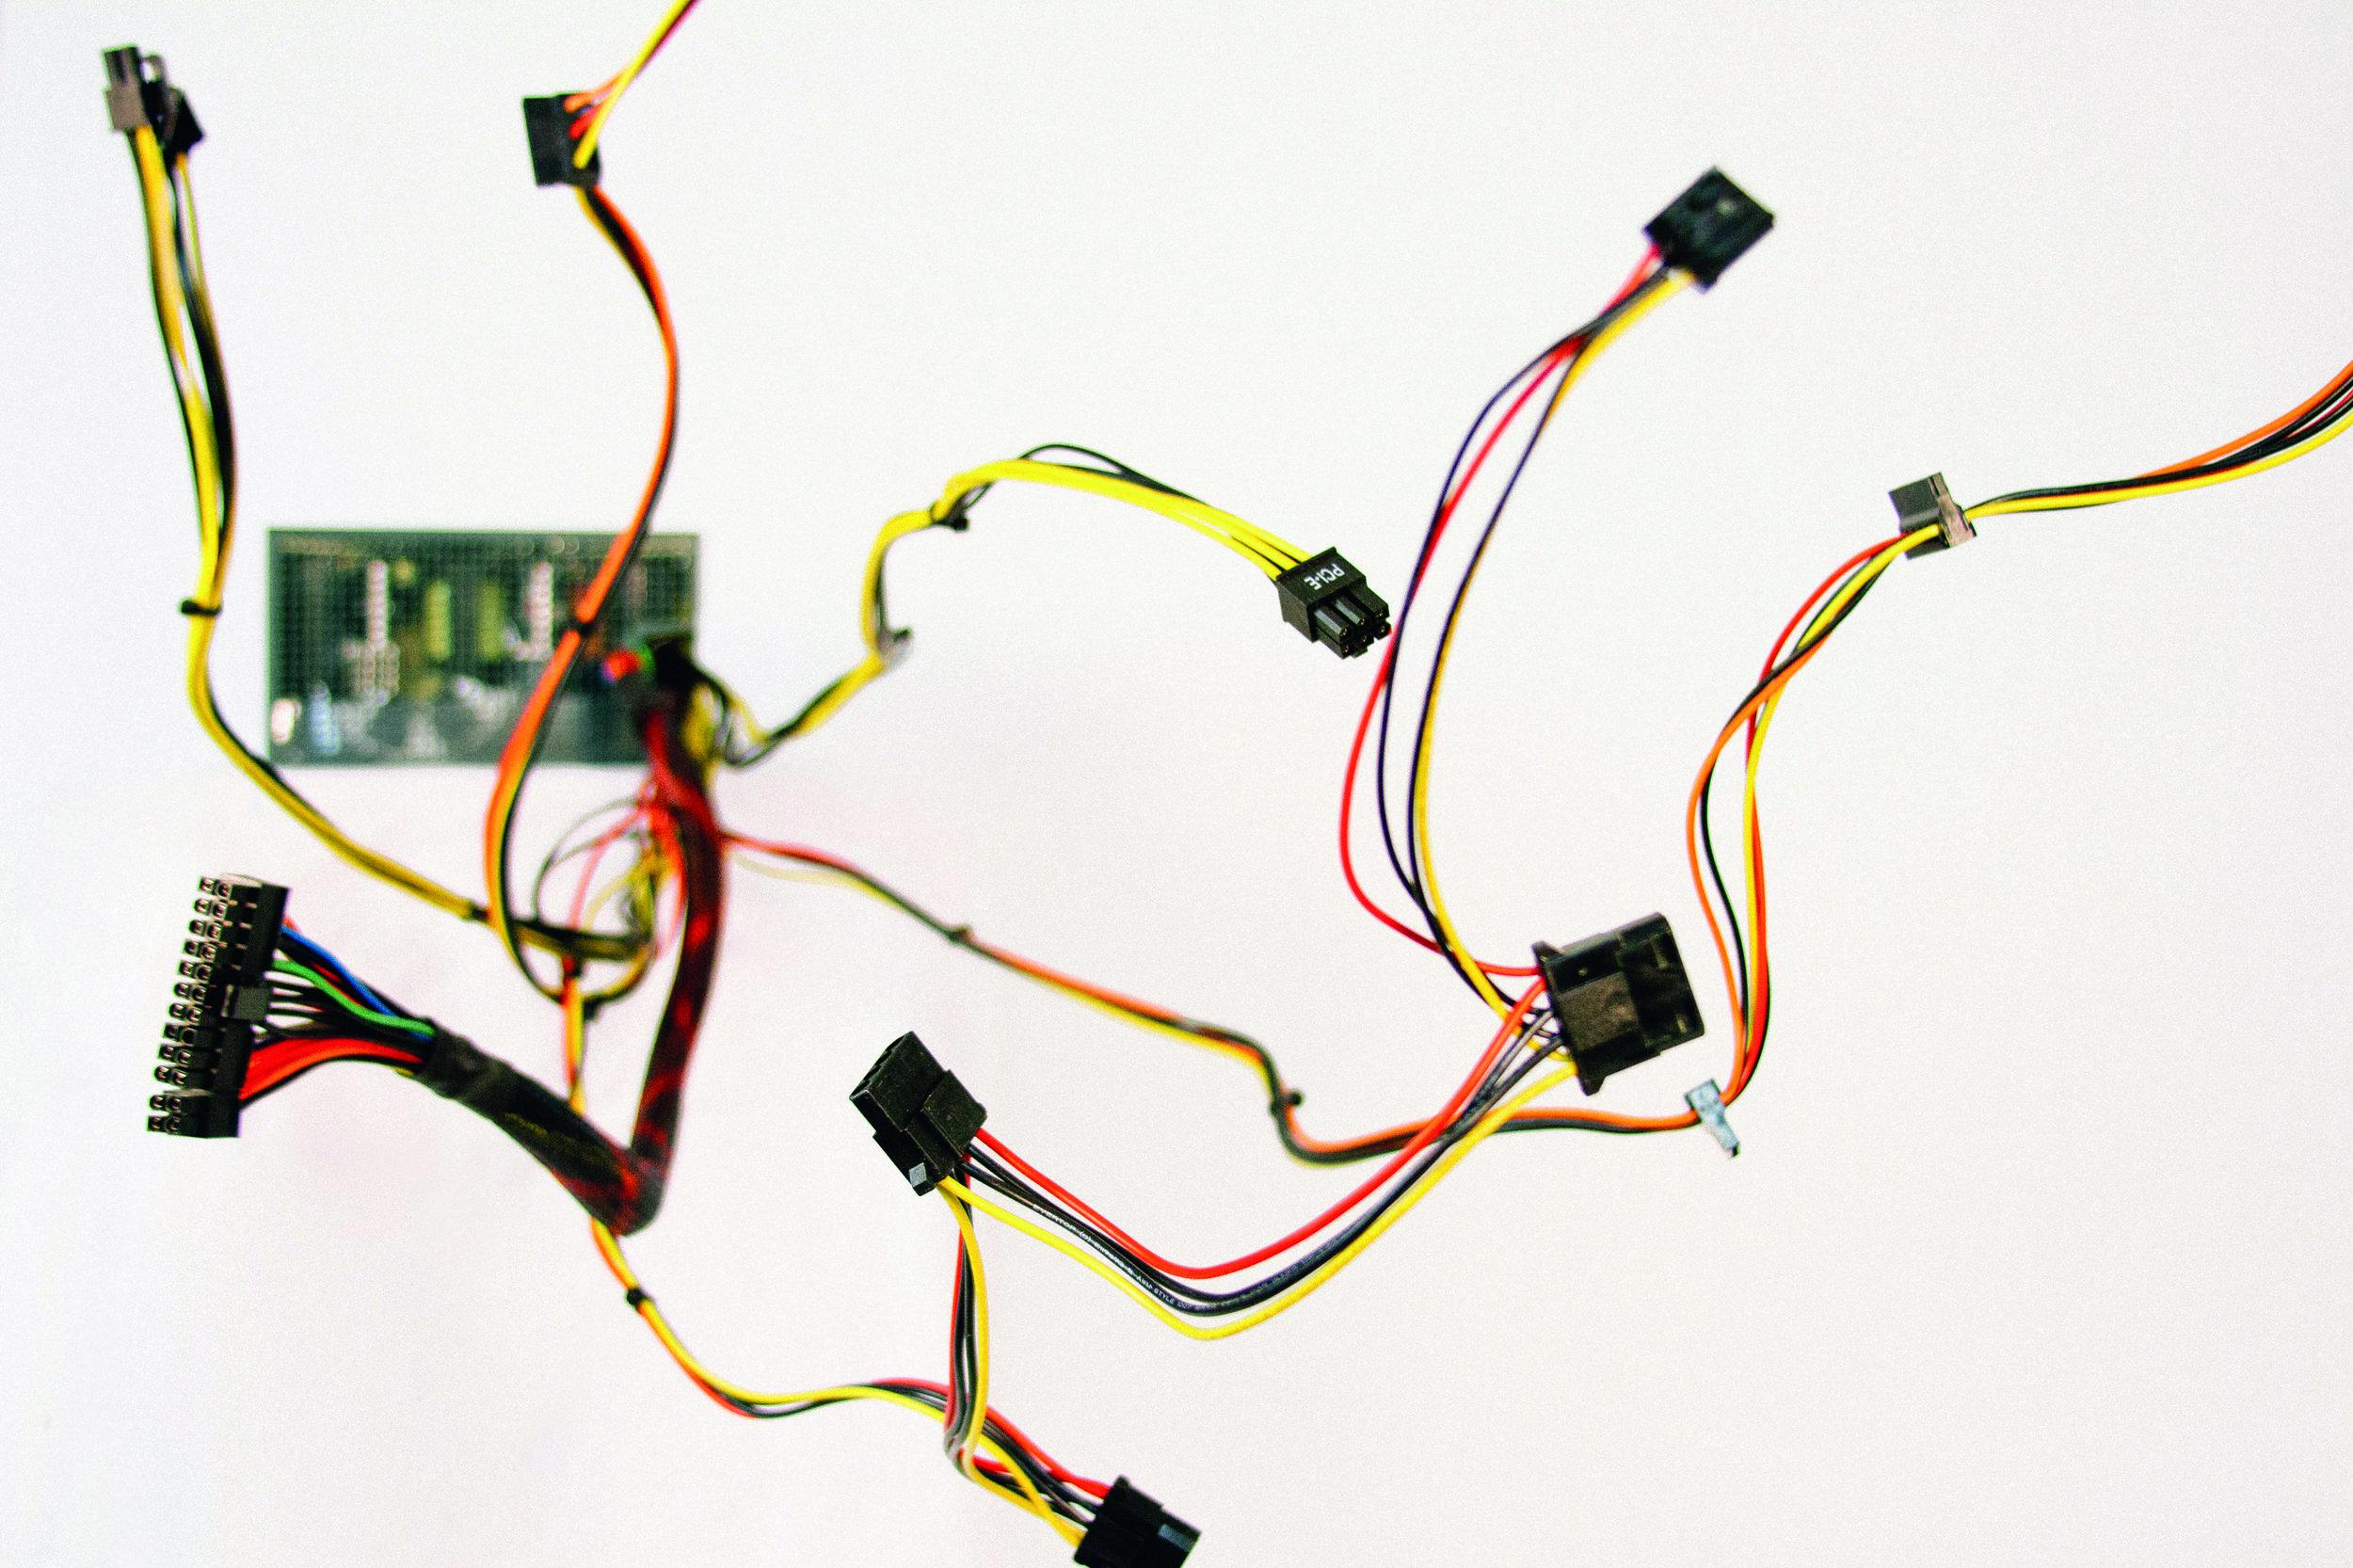 randall-bruder-136626-unsplash.jpg